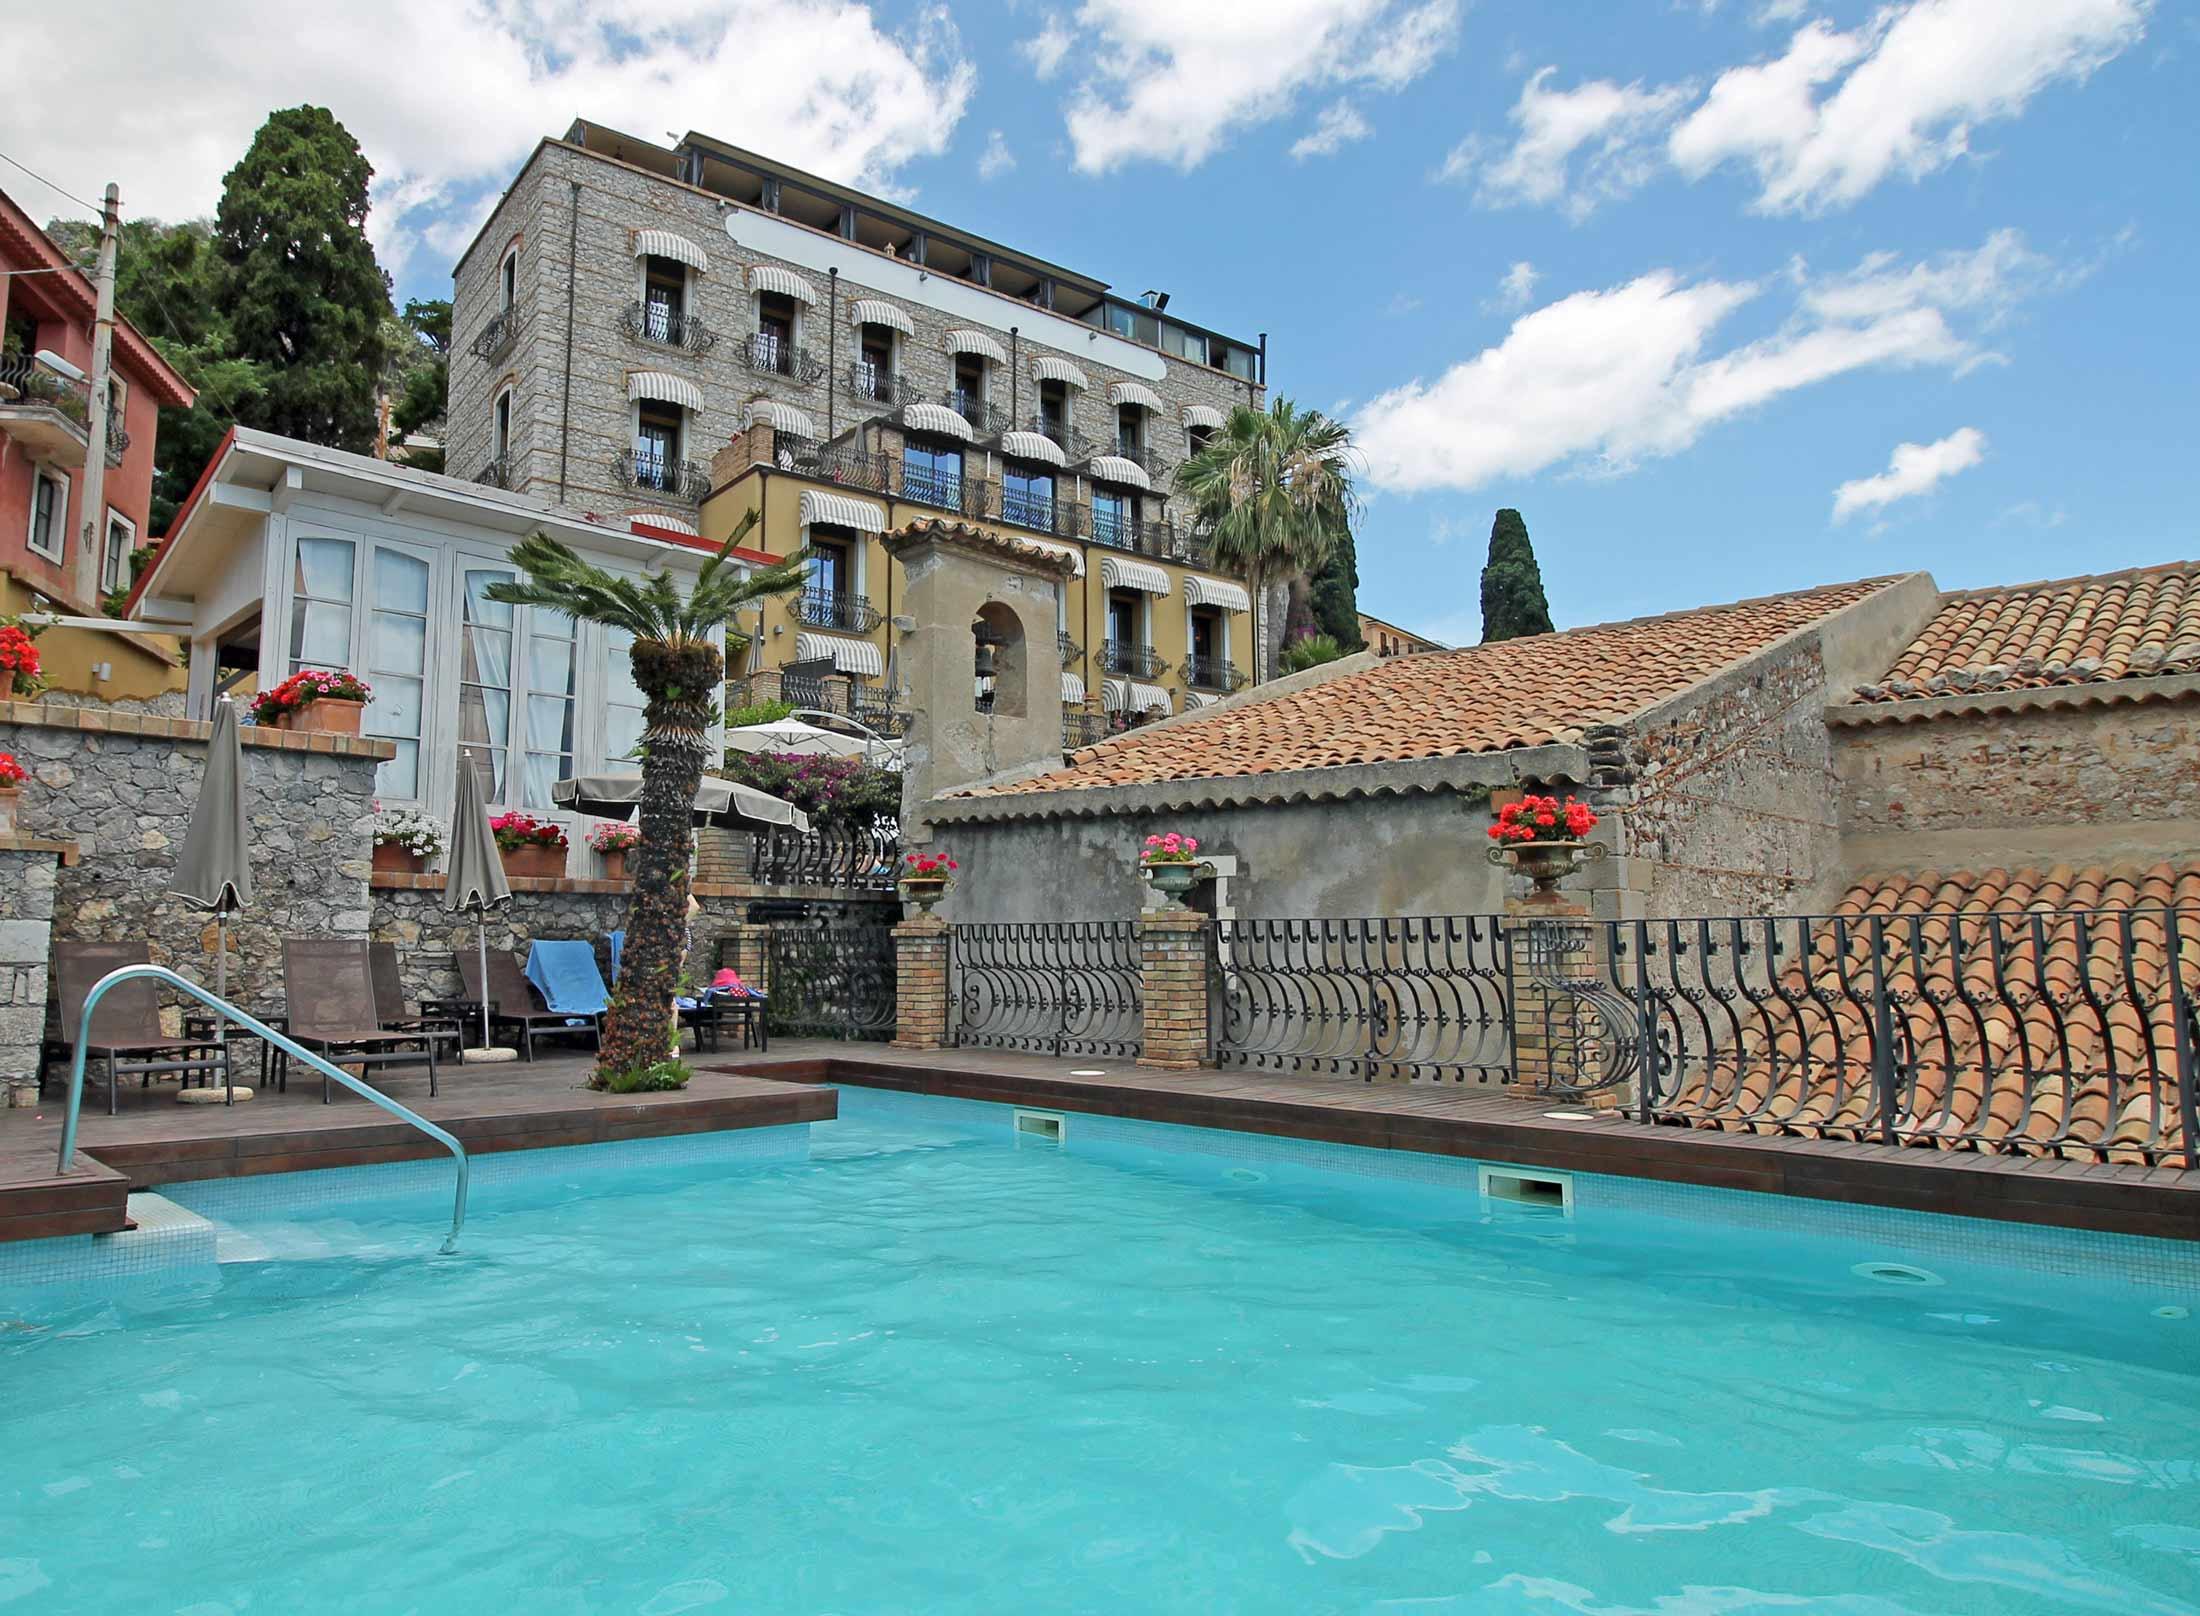 Hotel Villa Carlotta - Focal Journey (by Gustavo Espinola)